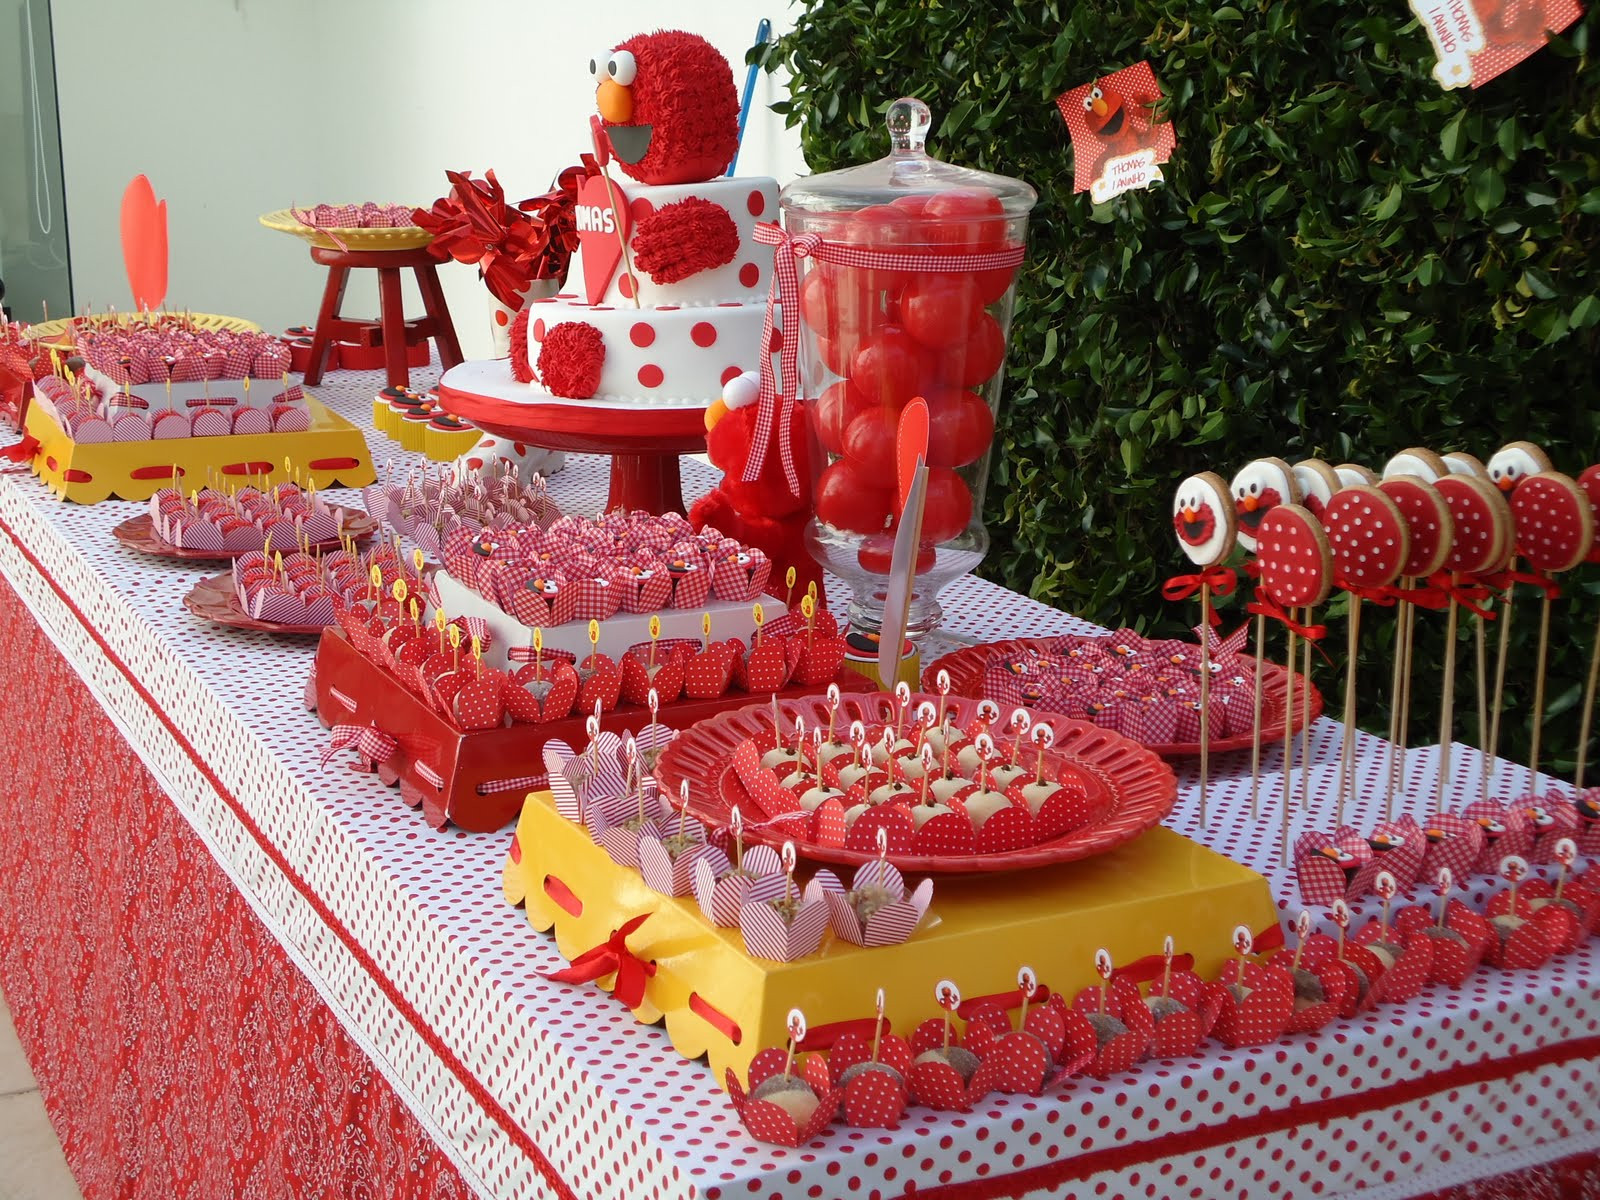 Best ideas about Elmo Birthday Decorations . Save or Pin Kara s Party Ideas Elmo Birthday Party Now.